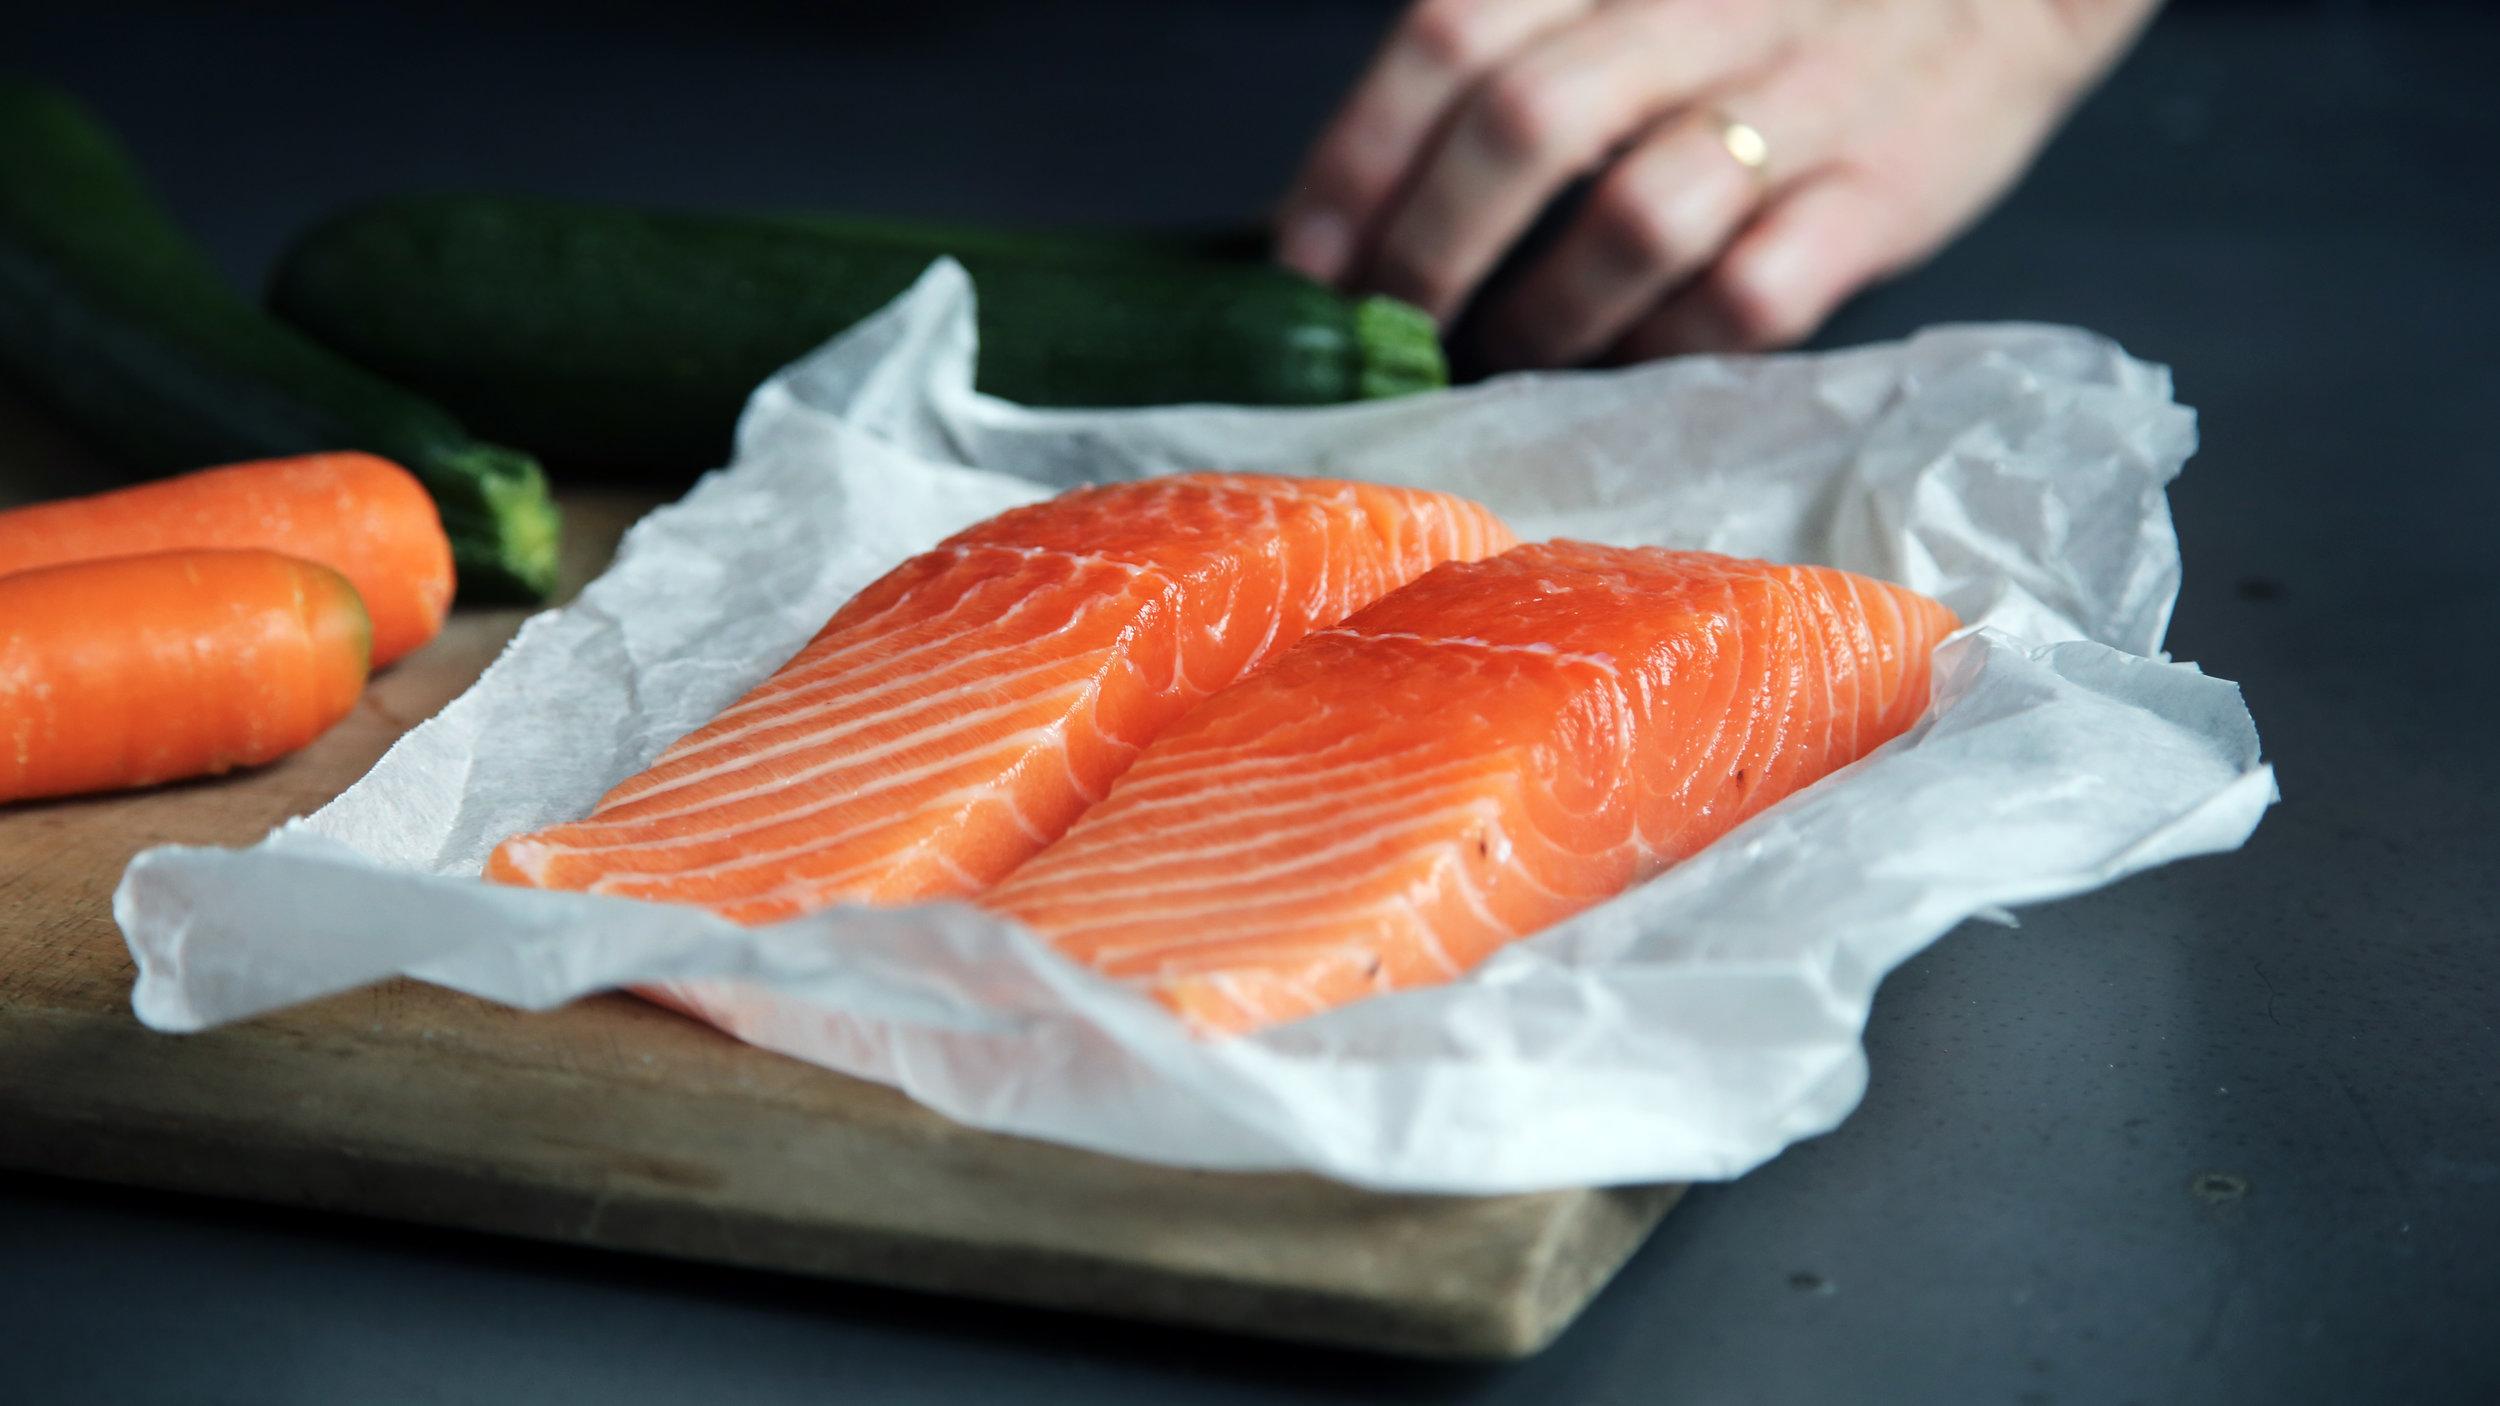 two slices of fresh salmon